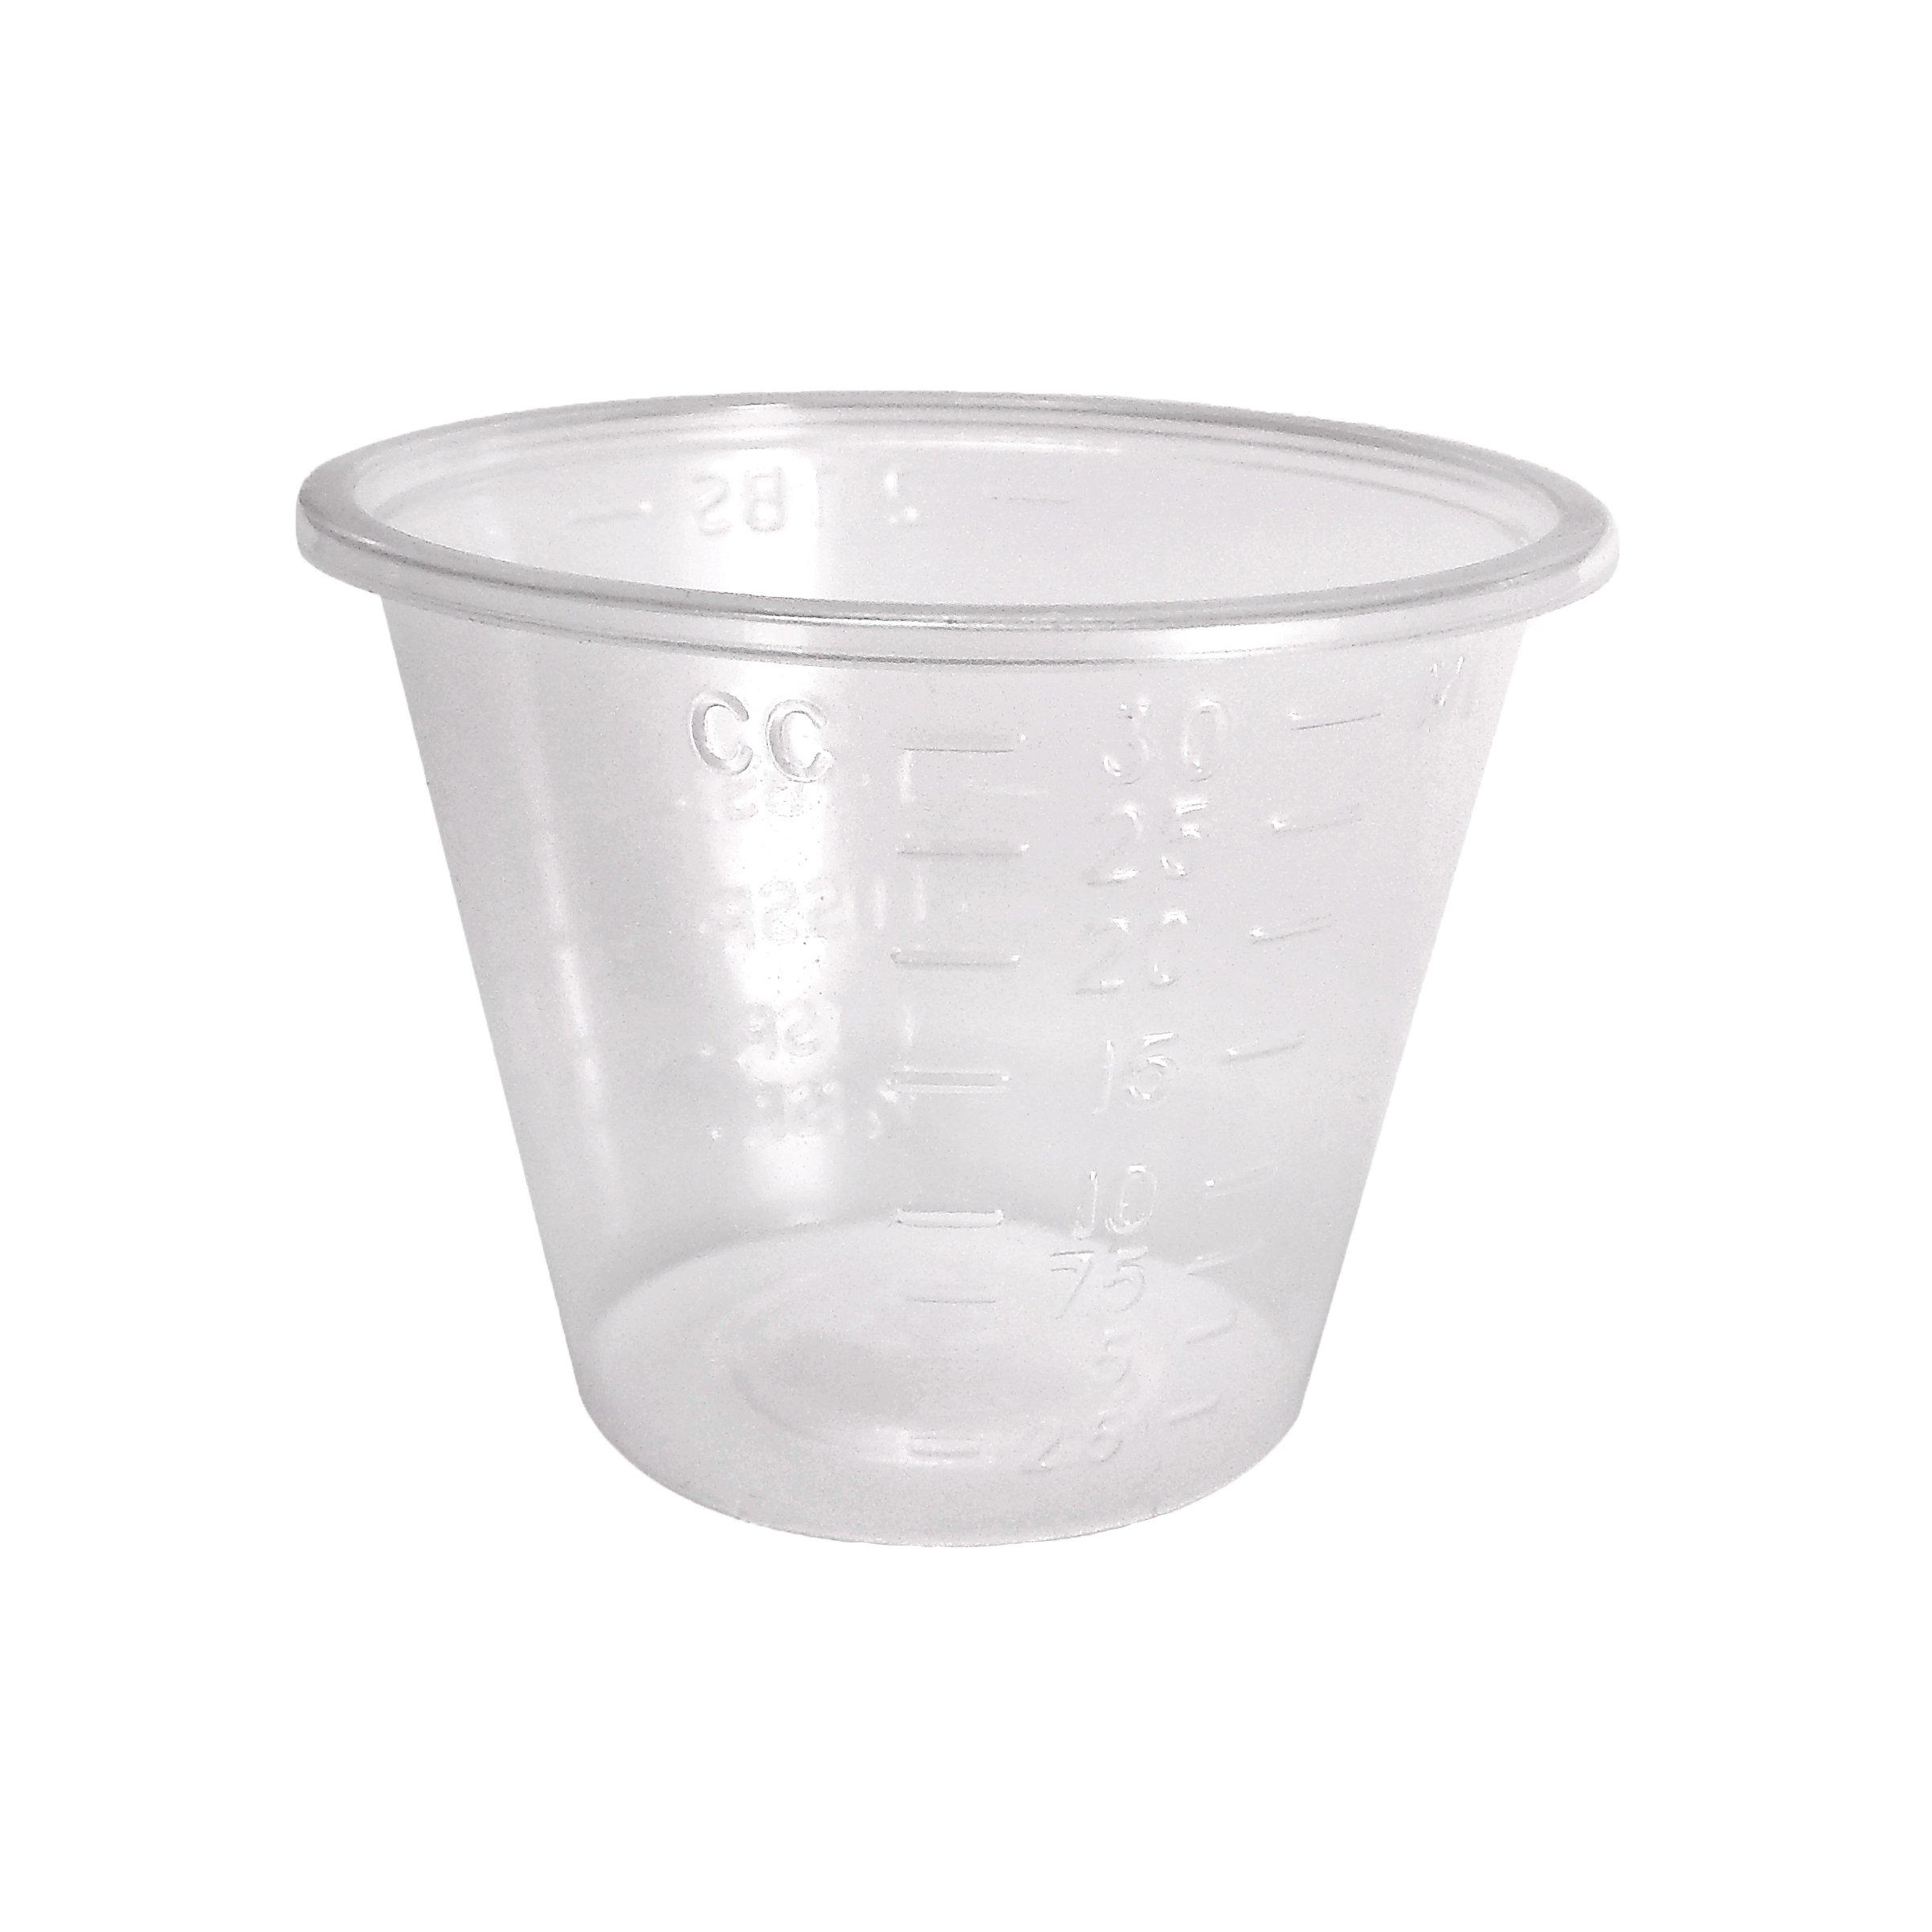 Medegen Medical Products 02301 Medicine Cup, 1 fl. oz. Capacity (Pack of 5000)